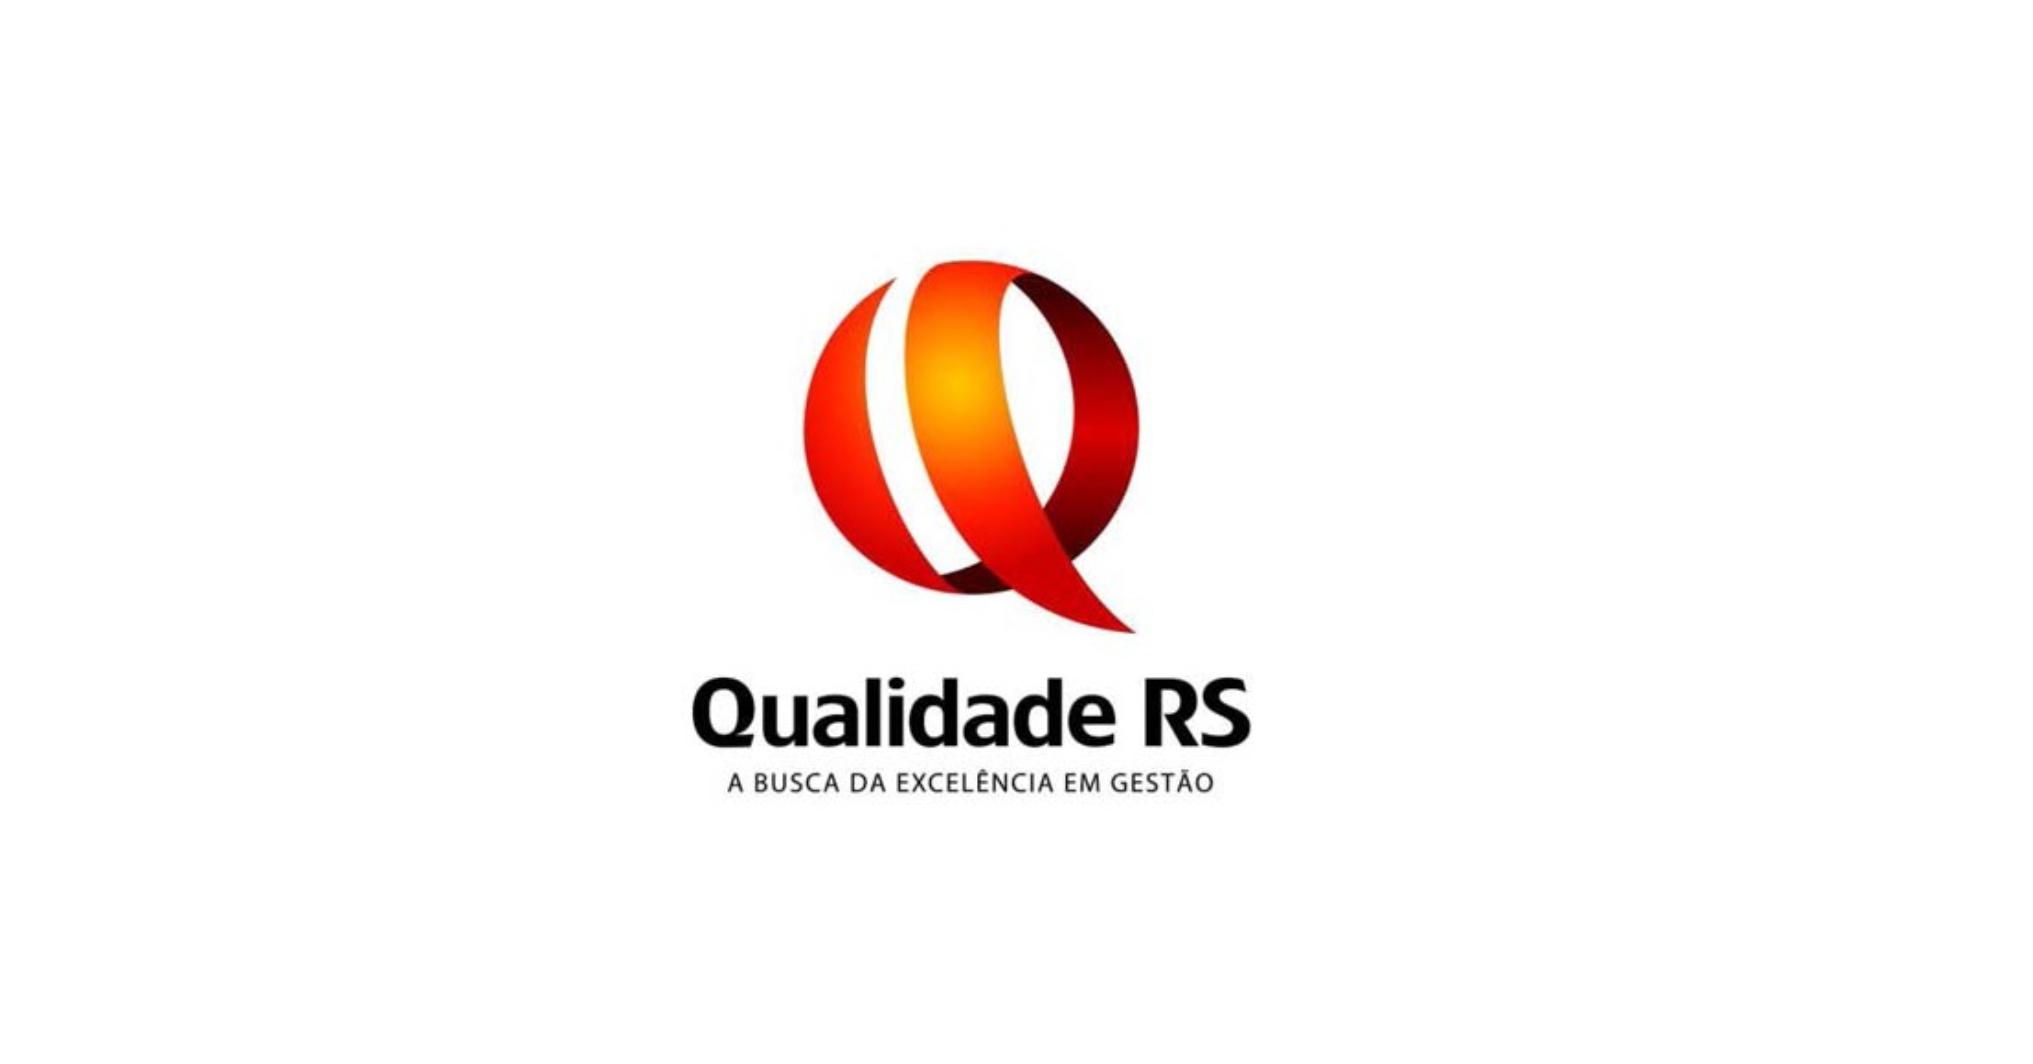 Qualidade RS